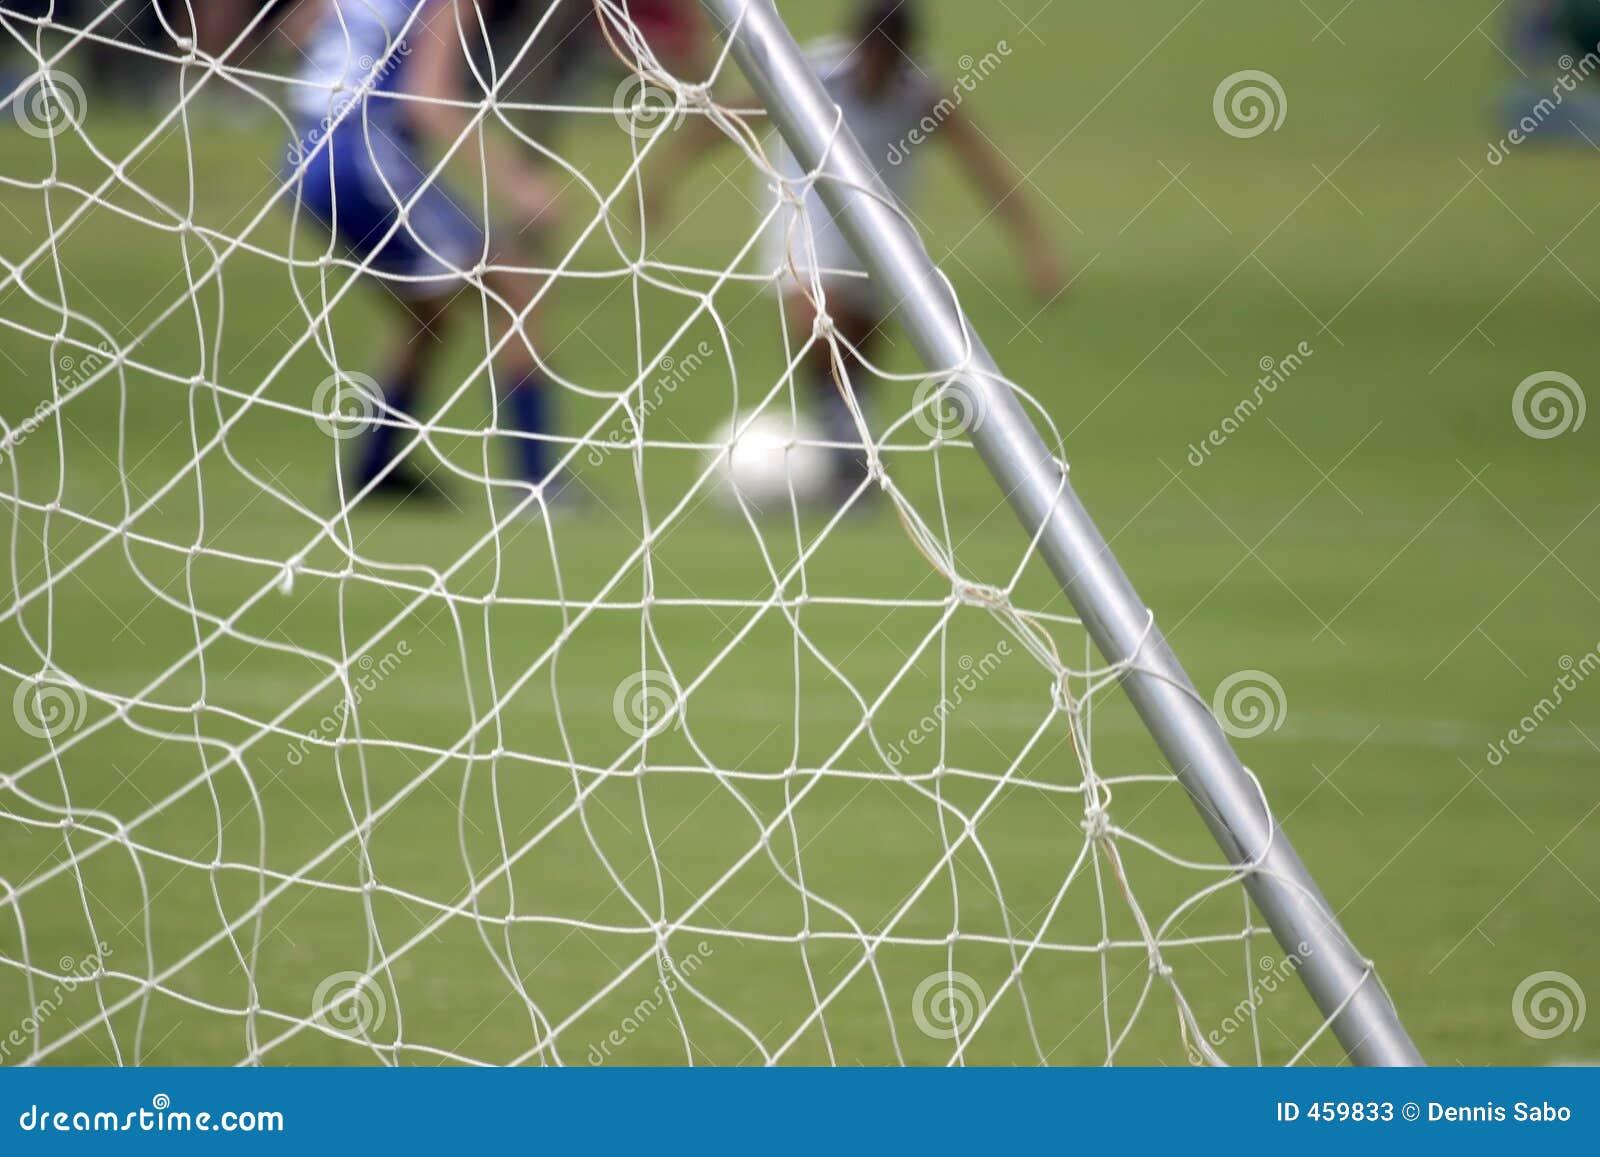 Netto fotboll